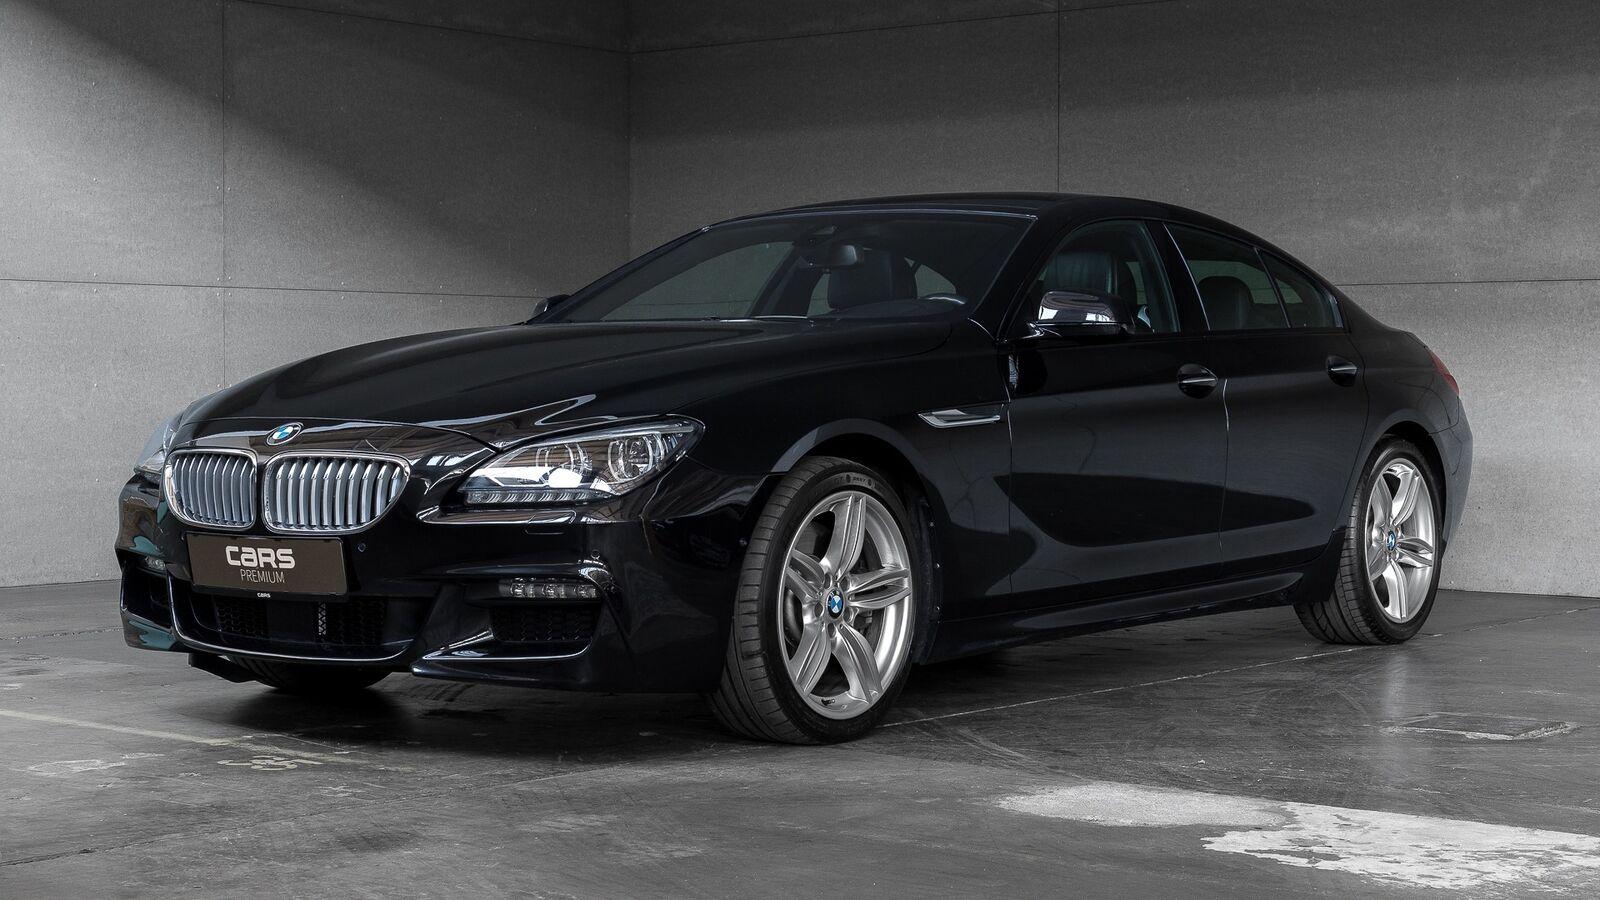 BMW 650i 4,4 Gran Coupé xDrive aut. 4d